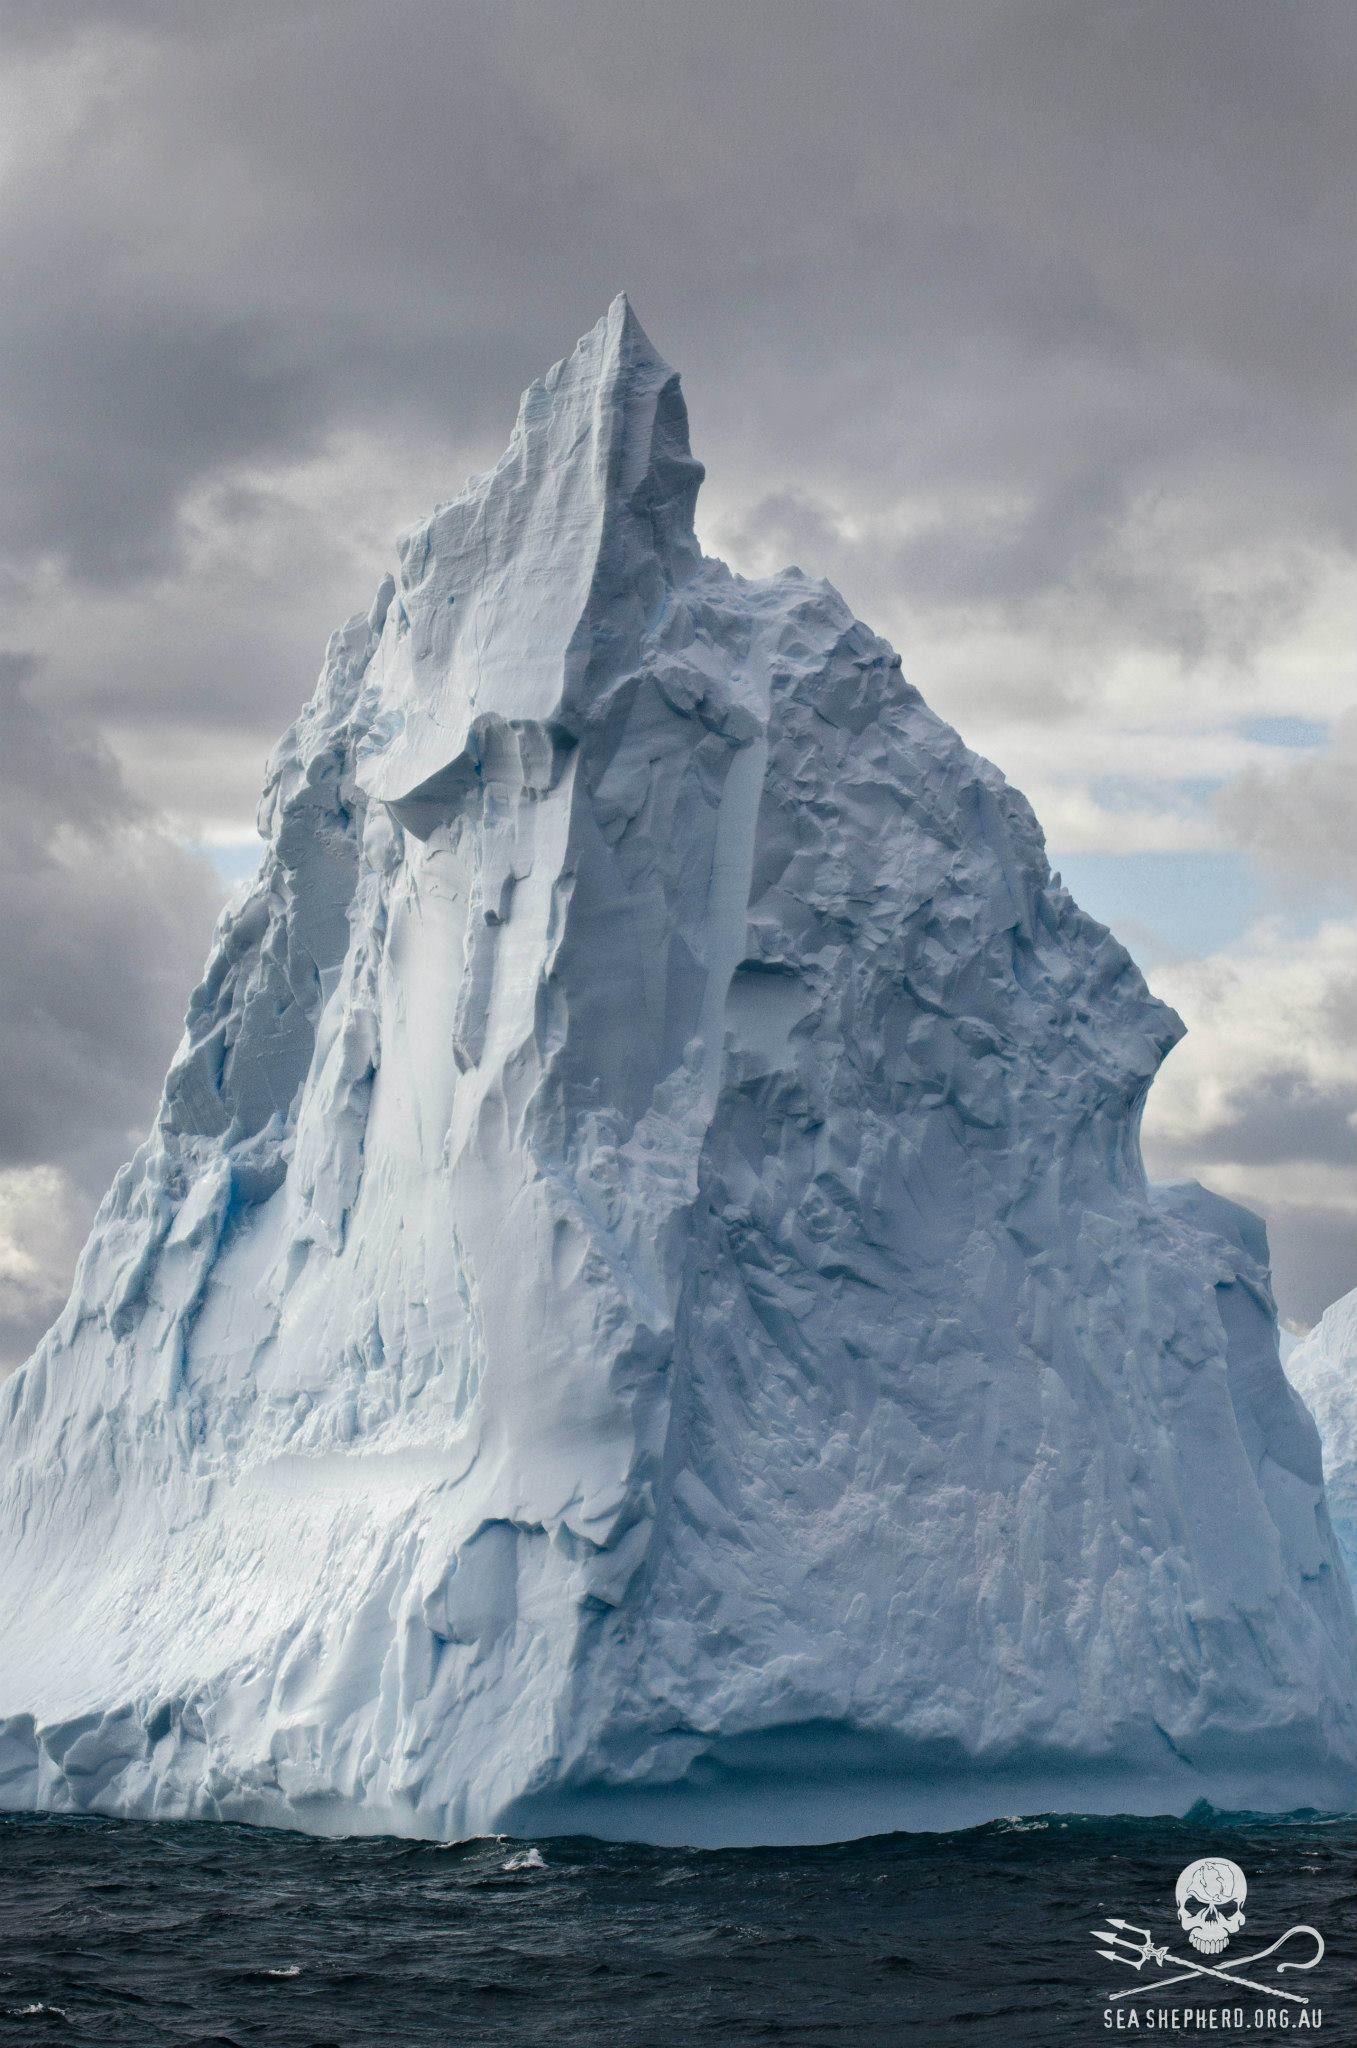 Antarctic Icebergs Towering High Seashepherd Antarctica Iceberg Photography Landscape Life Ocean Antarctica Antarctica Travel Antarctica Cruise